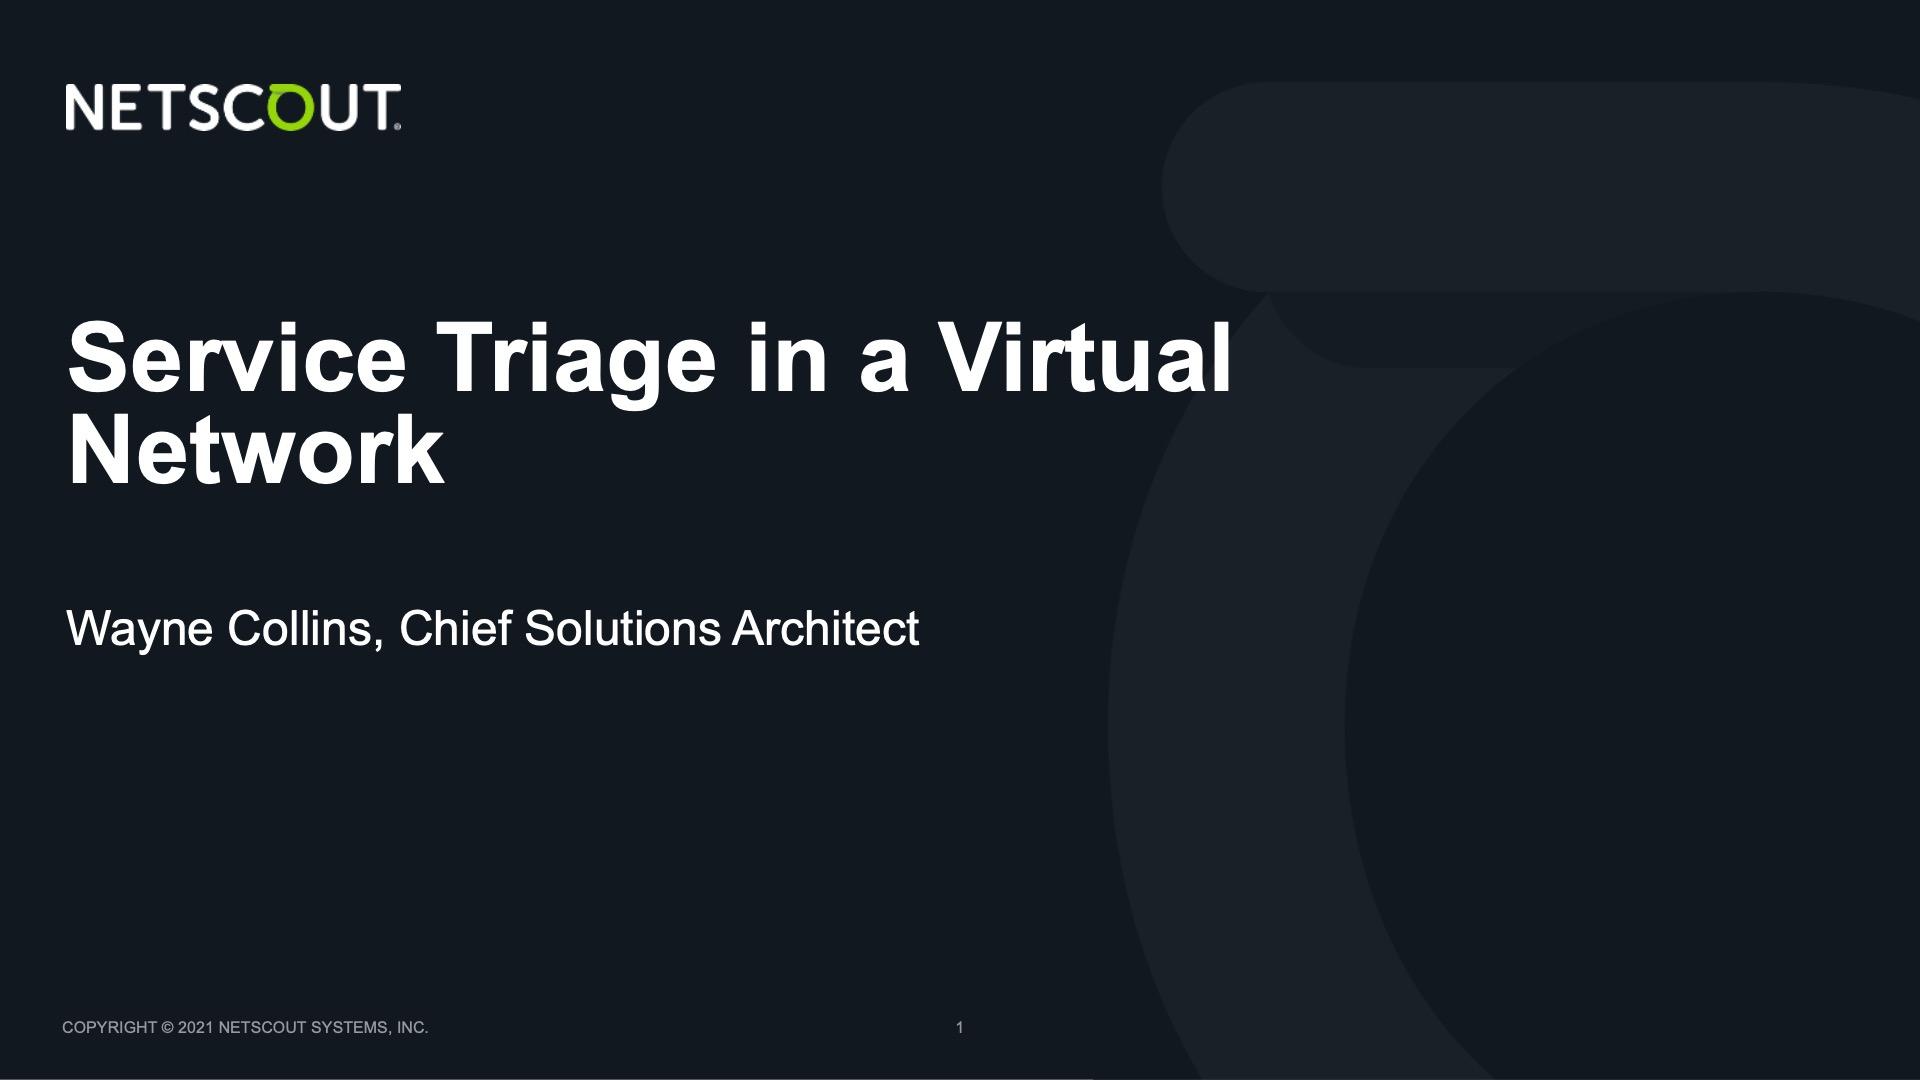 Service Triage in a Virtual Network